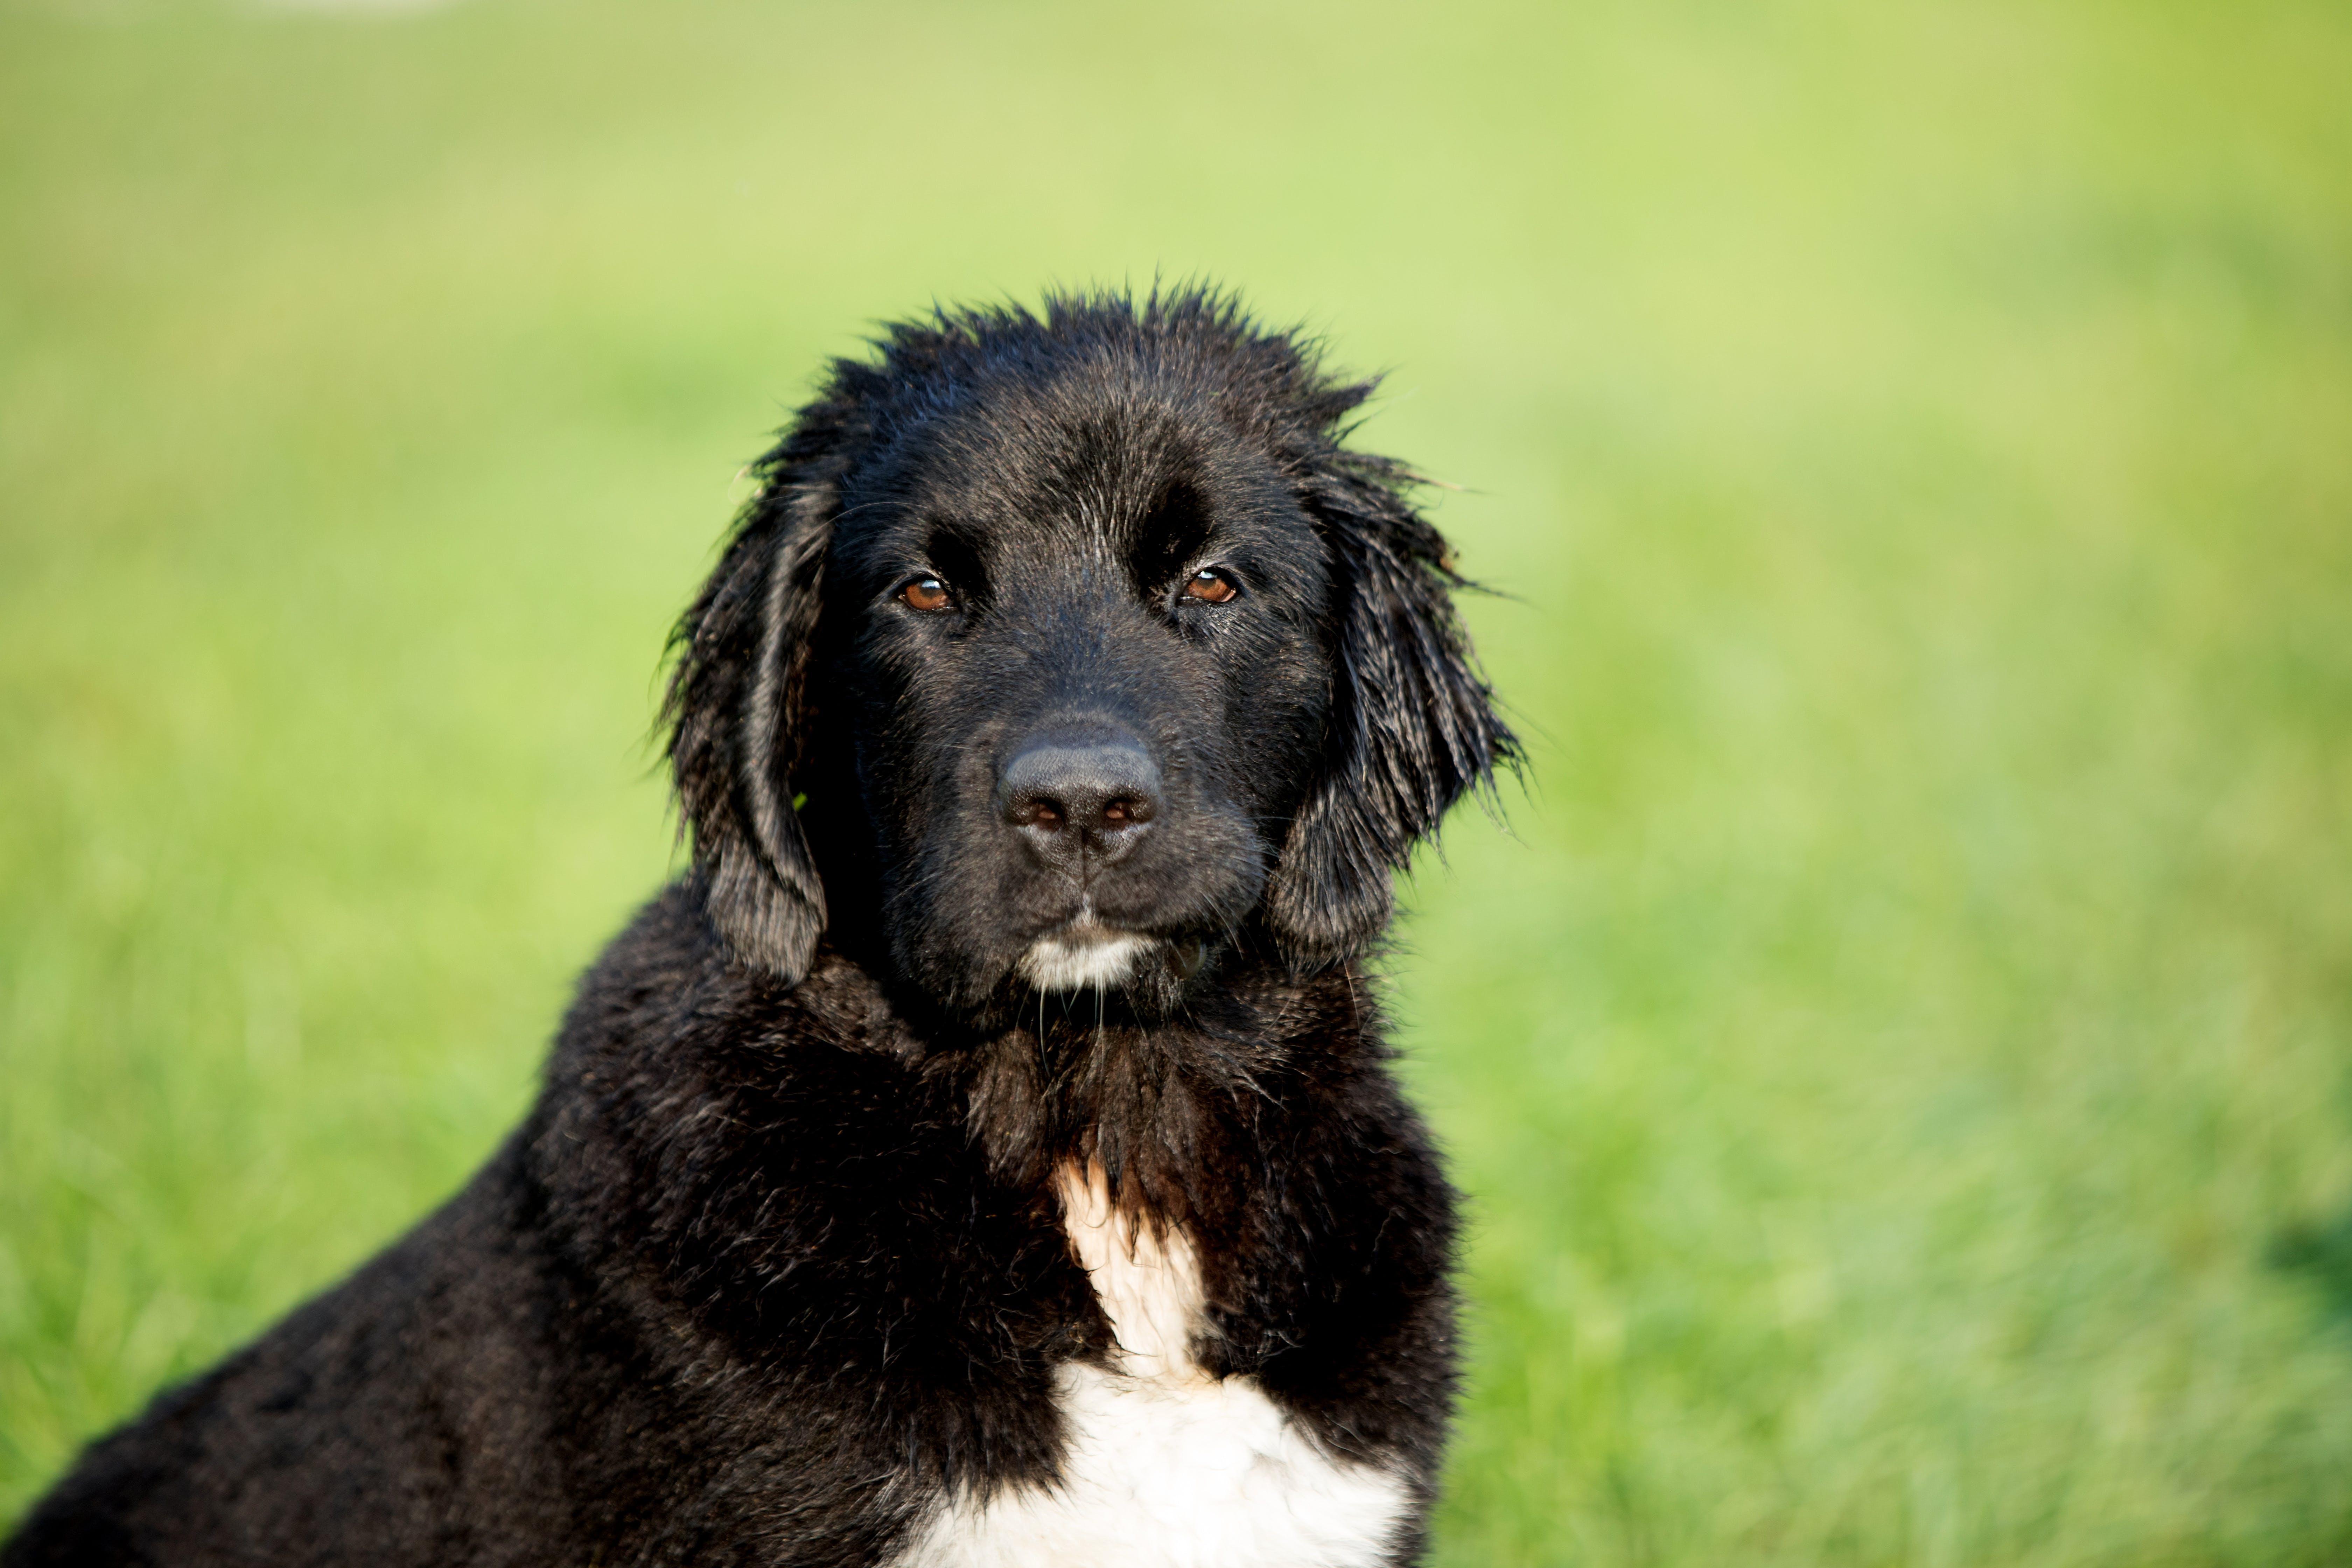 Short-coated Black and White Dog on Lush Pasture Selective Focal Photo